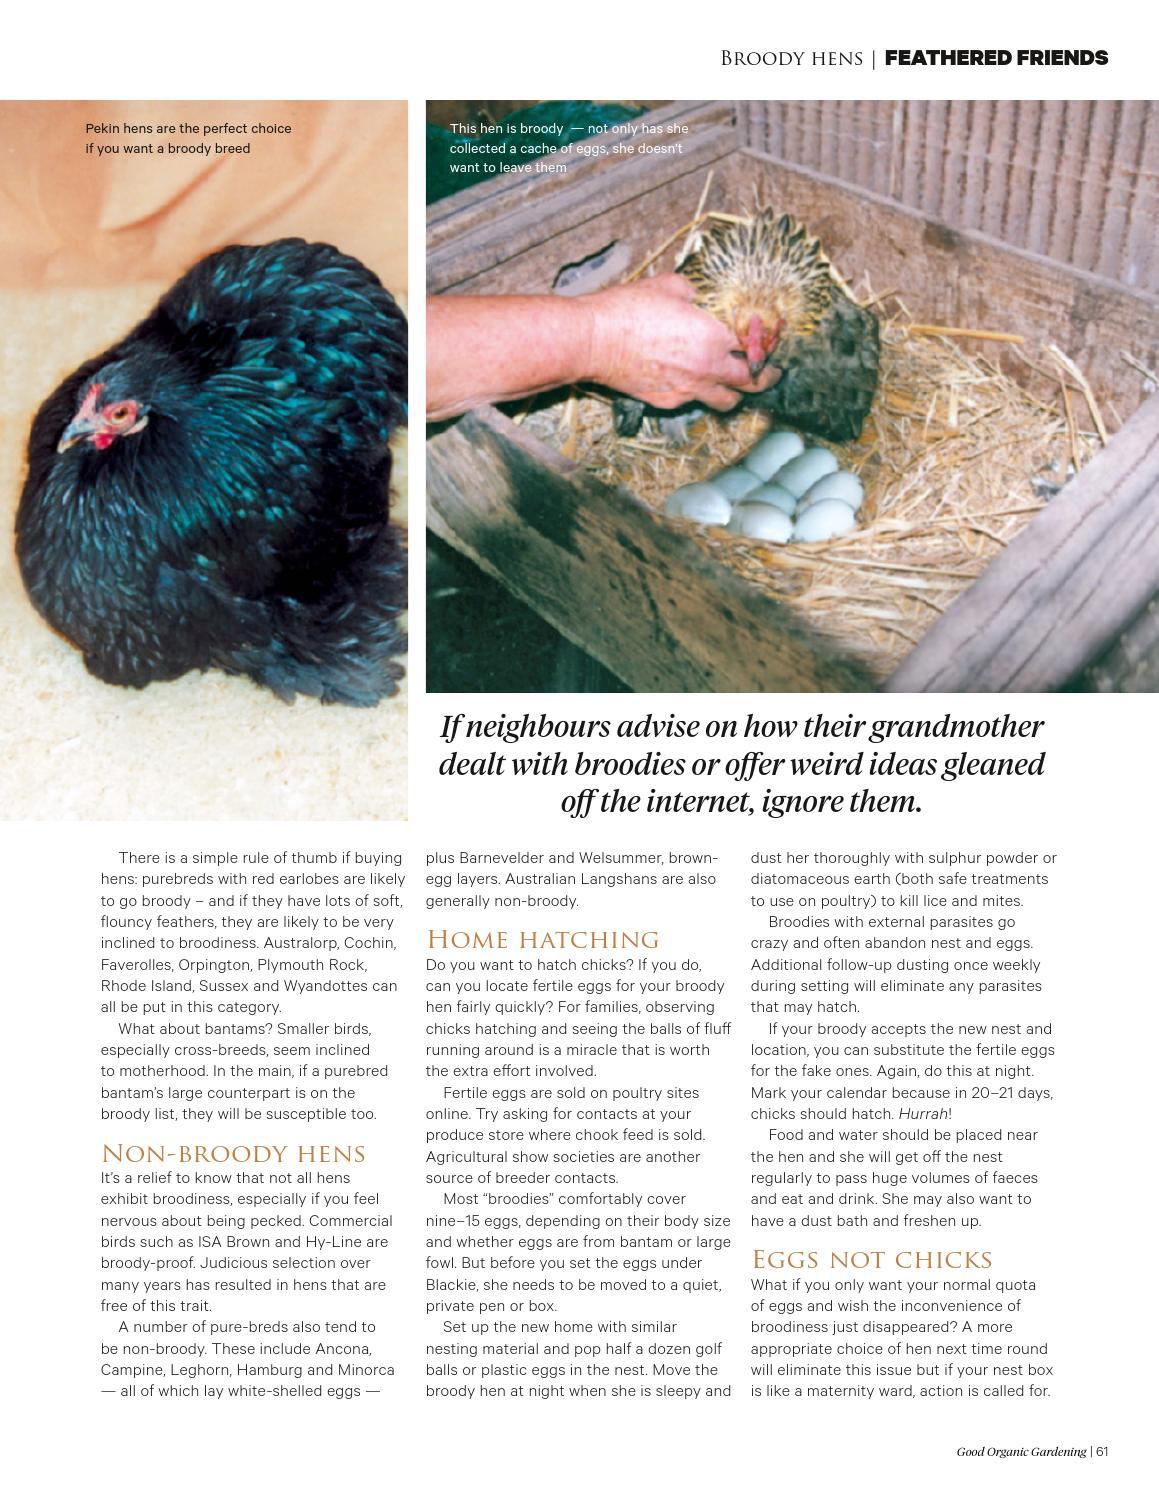 Good Organic Gardening Issue 4 5 By Good Organic Gardening